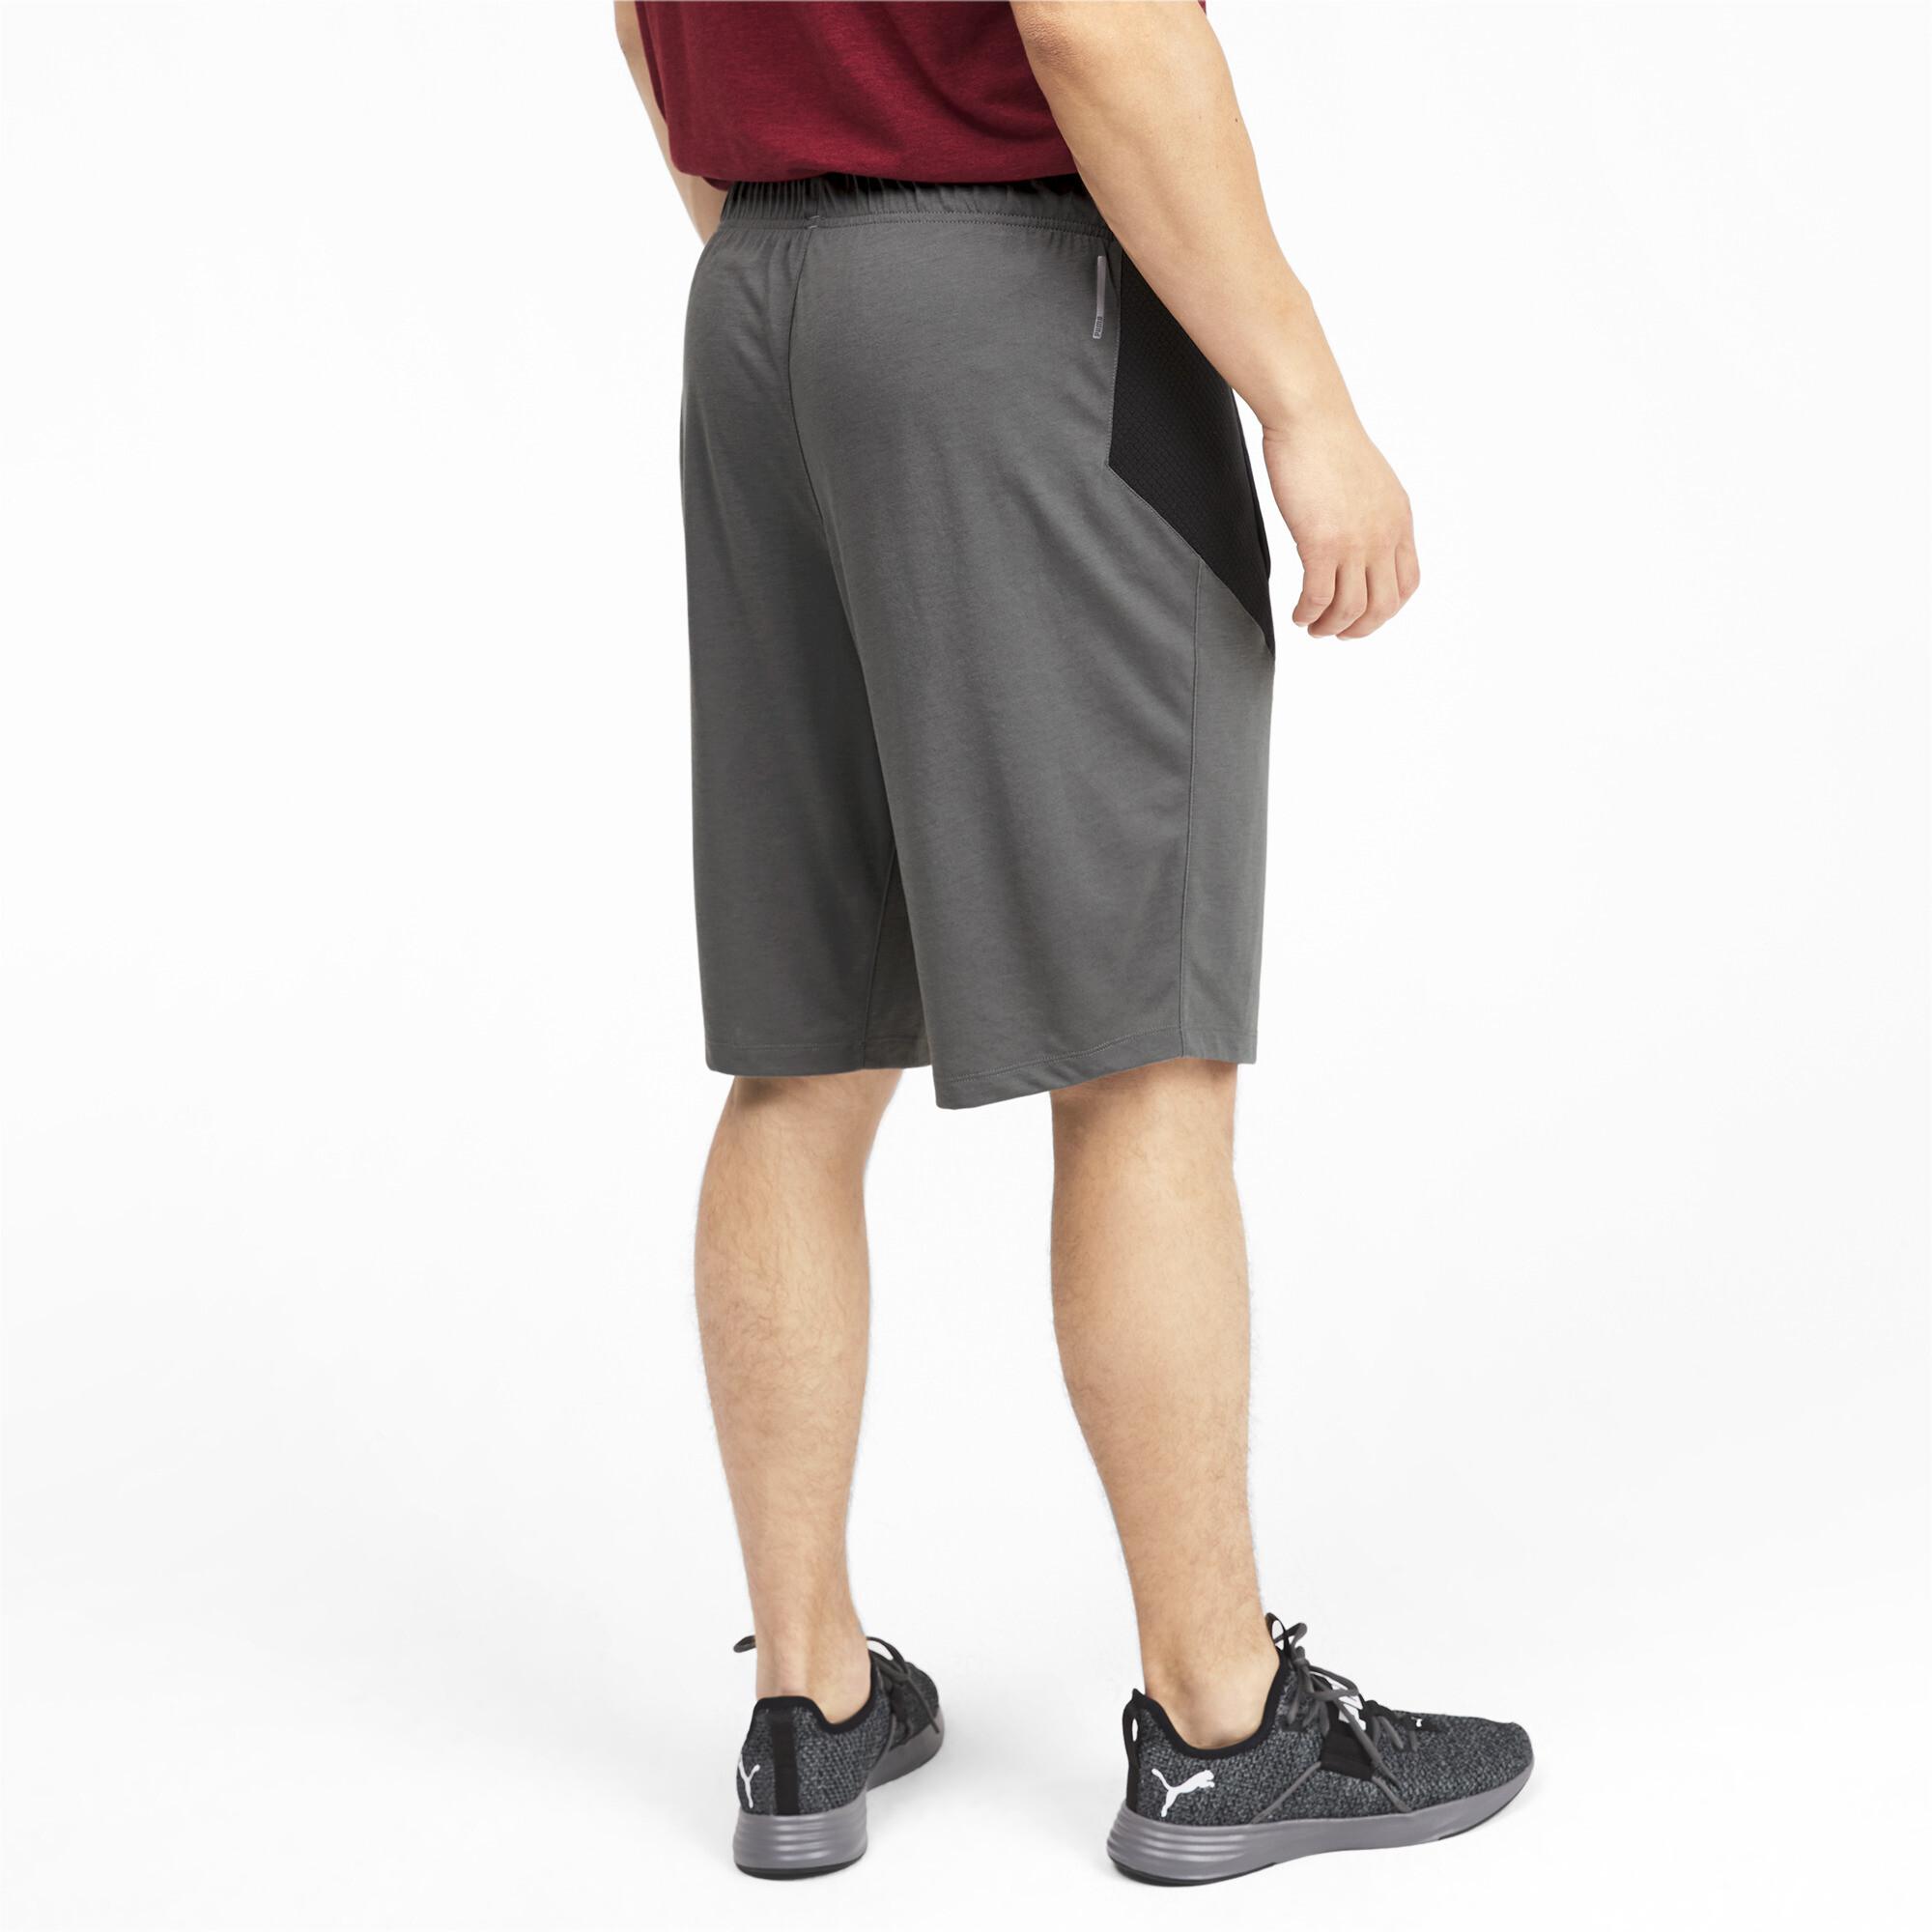 PUMA-Reactive-Drirelease-Men-039-s-Shorts-Men-Knitted-Shorts-Training thumbnail 5